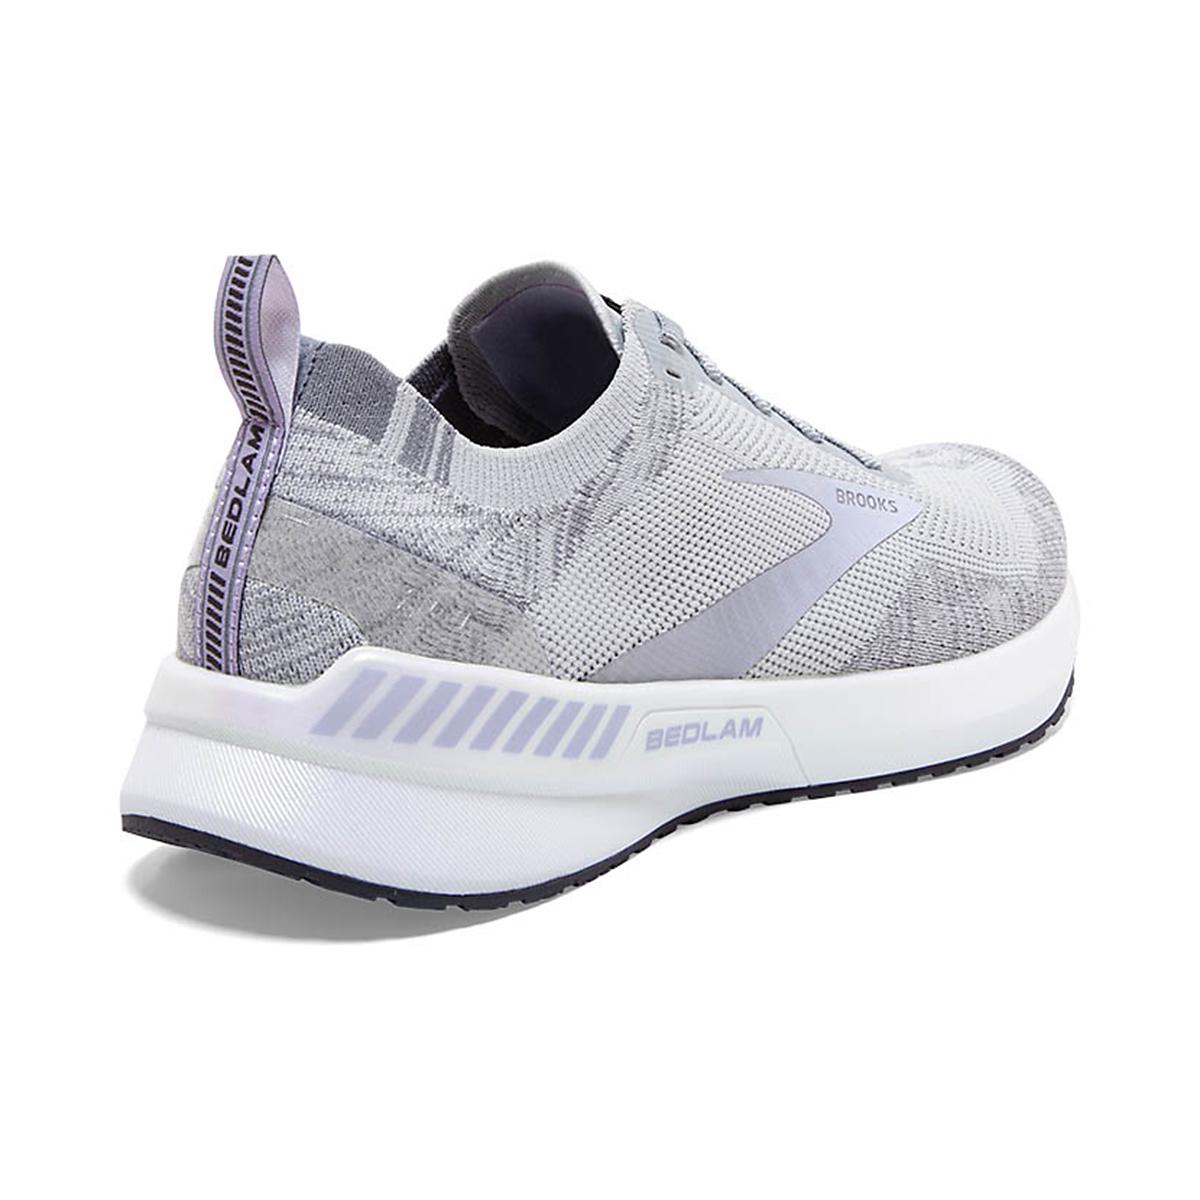 Women's Brooks Bedlam 3 Running Shoe - Color: Oyster/Purple Heather - Size: 5 - Width: Regular, Oyster/Purple Heather, large, image 4